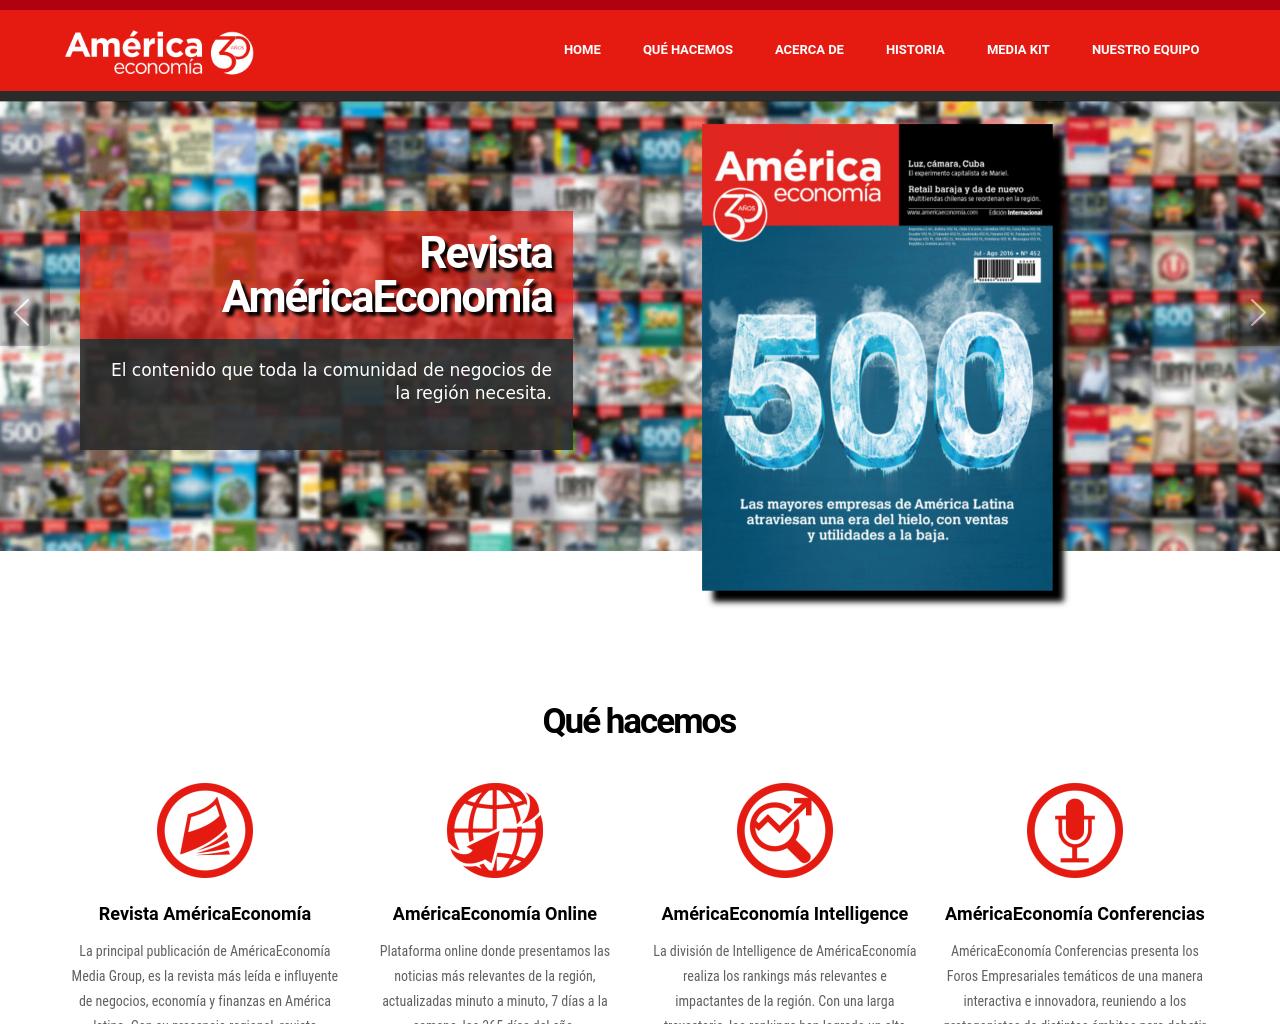 AméricaEconomía-Advertising-&-Marketing-Advertising-Reviews-Pricing